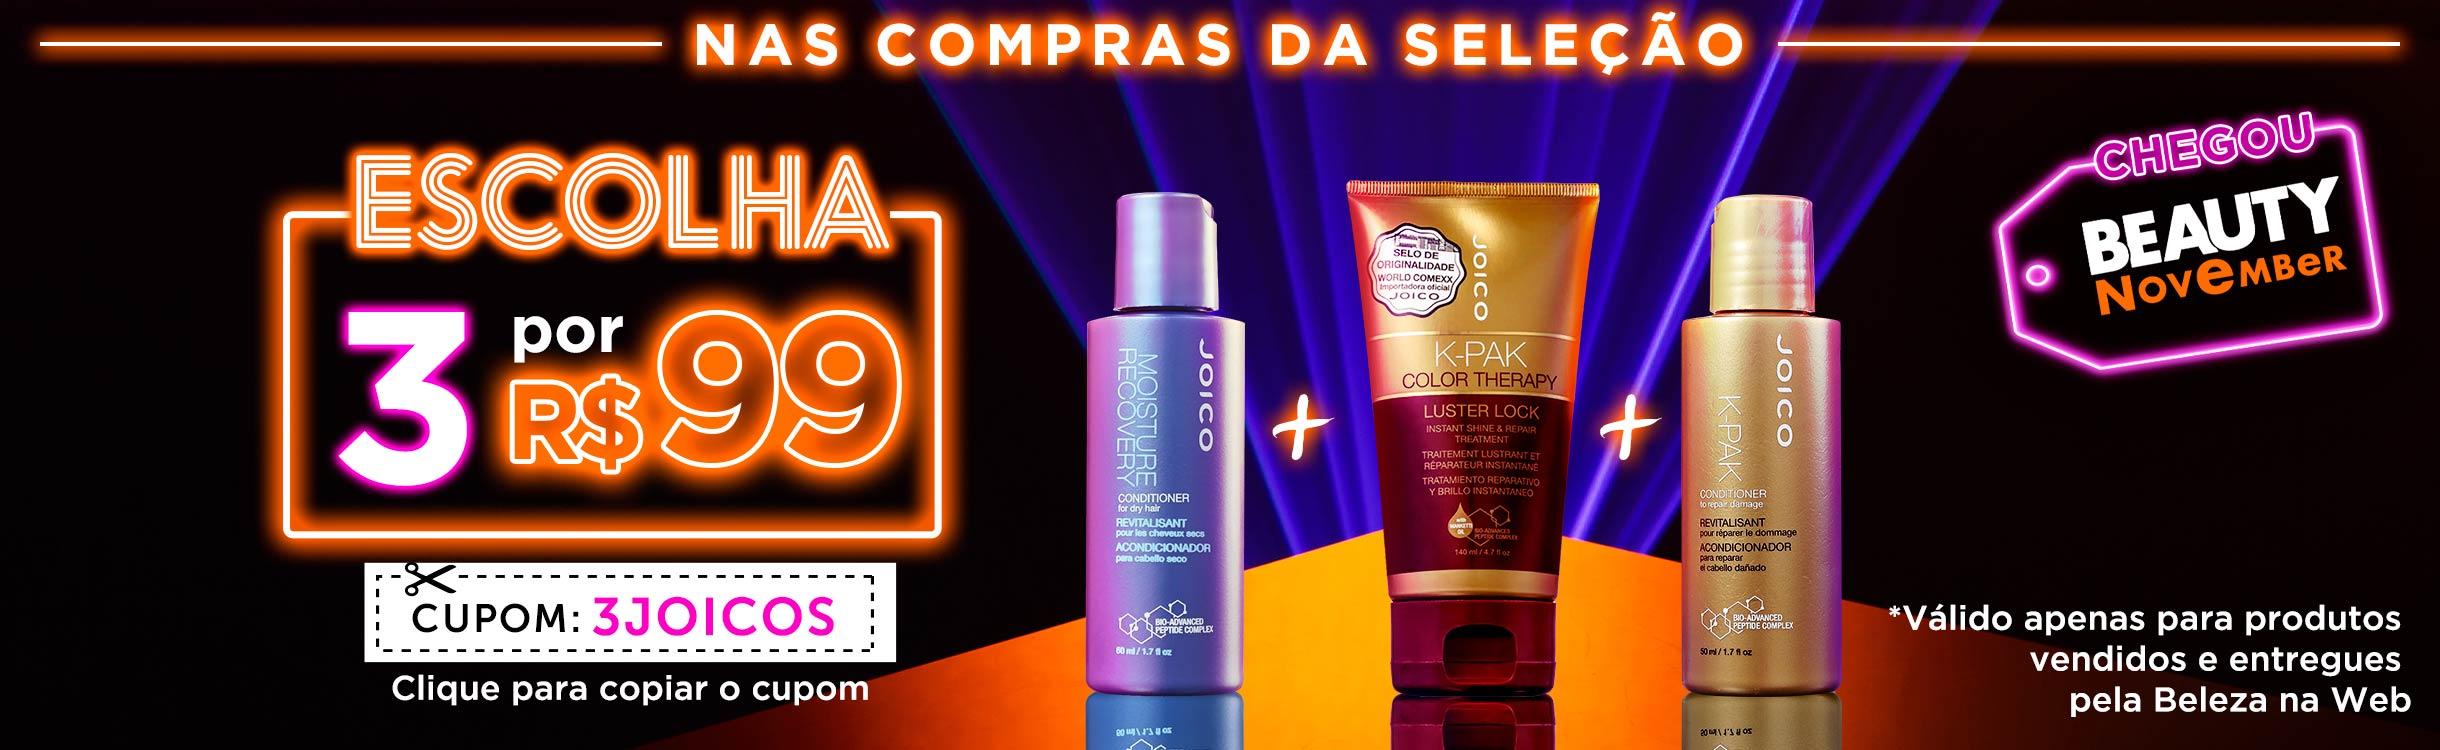 Beauty Friday | 3 Joicos por R$ 99